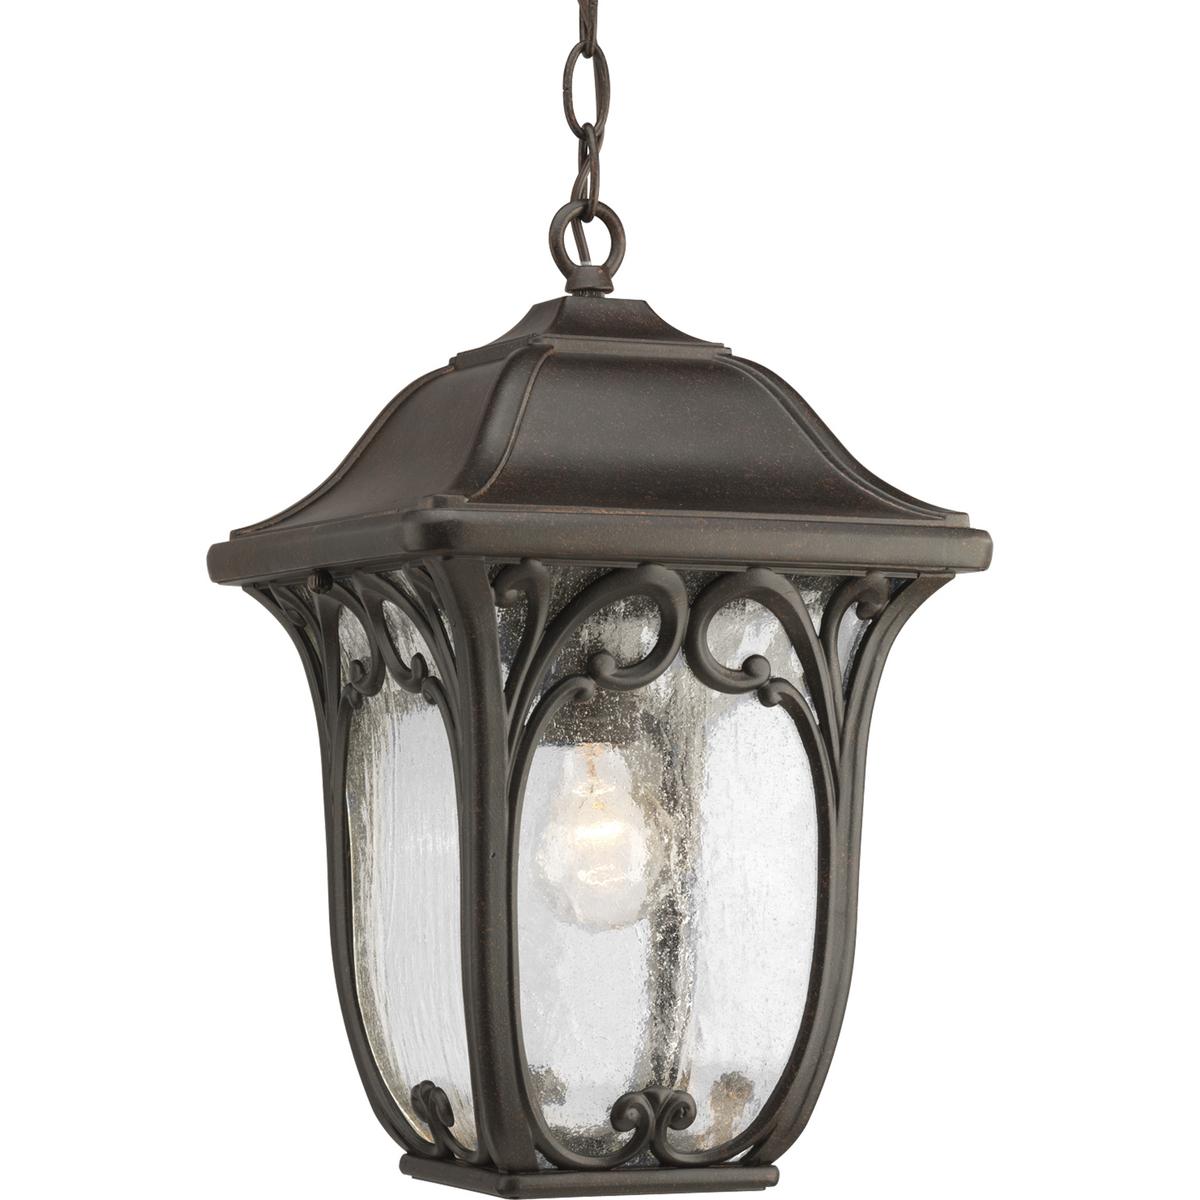 PRO P6501-84 One Light Espresso Etched Glass Hanging Lantern 1X100Medium